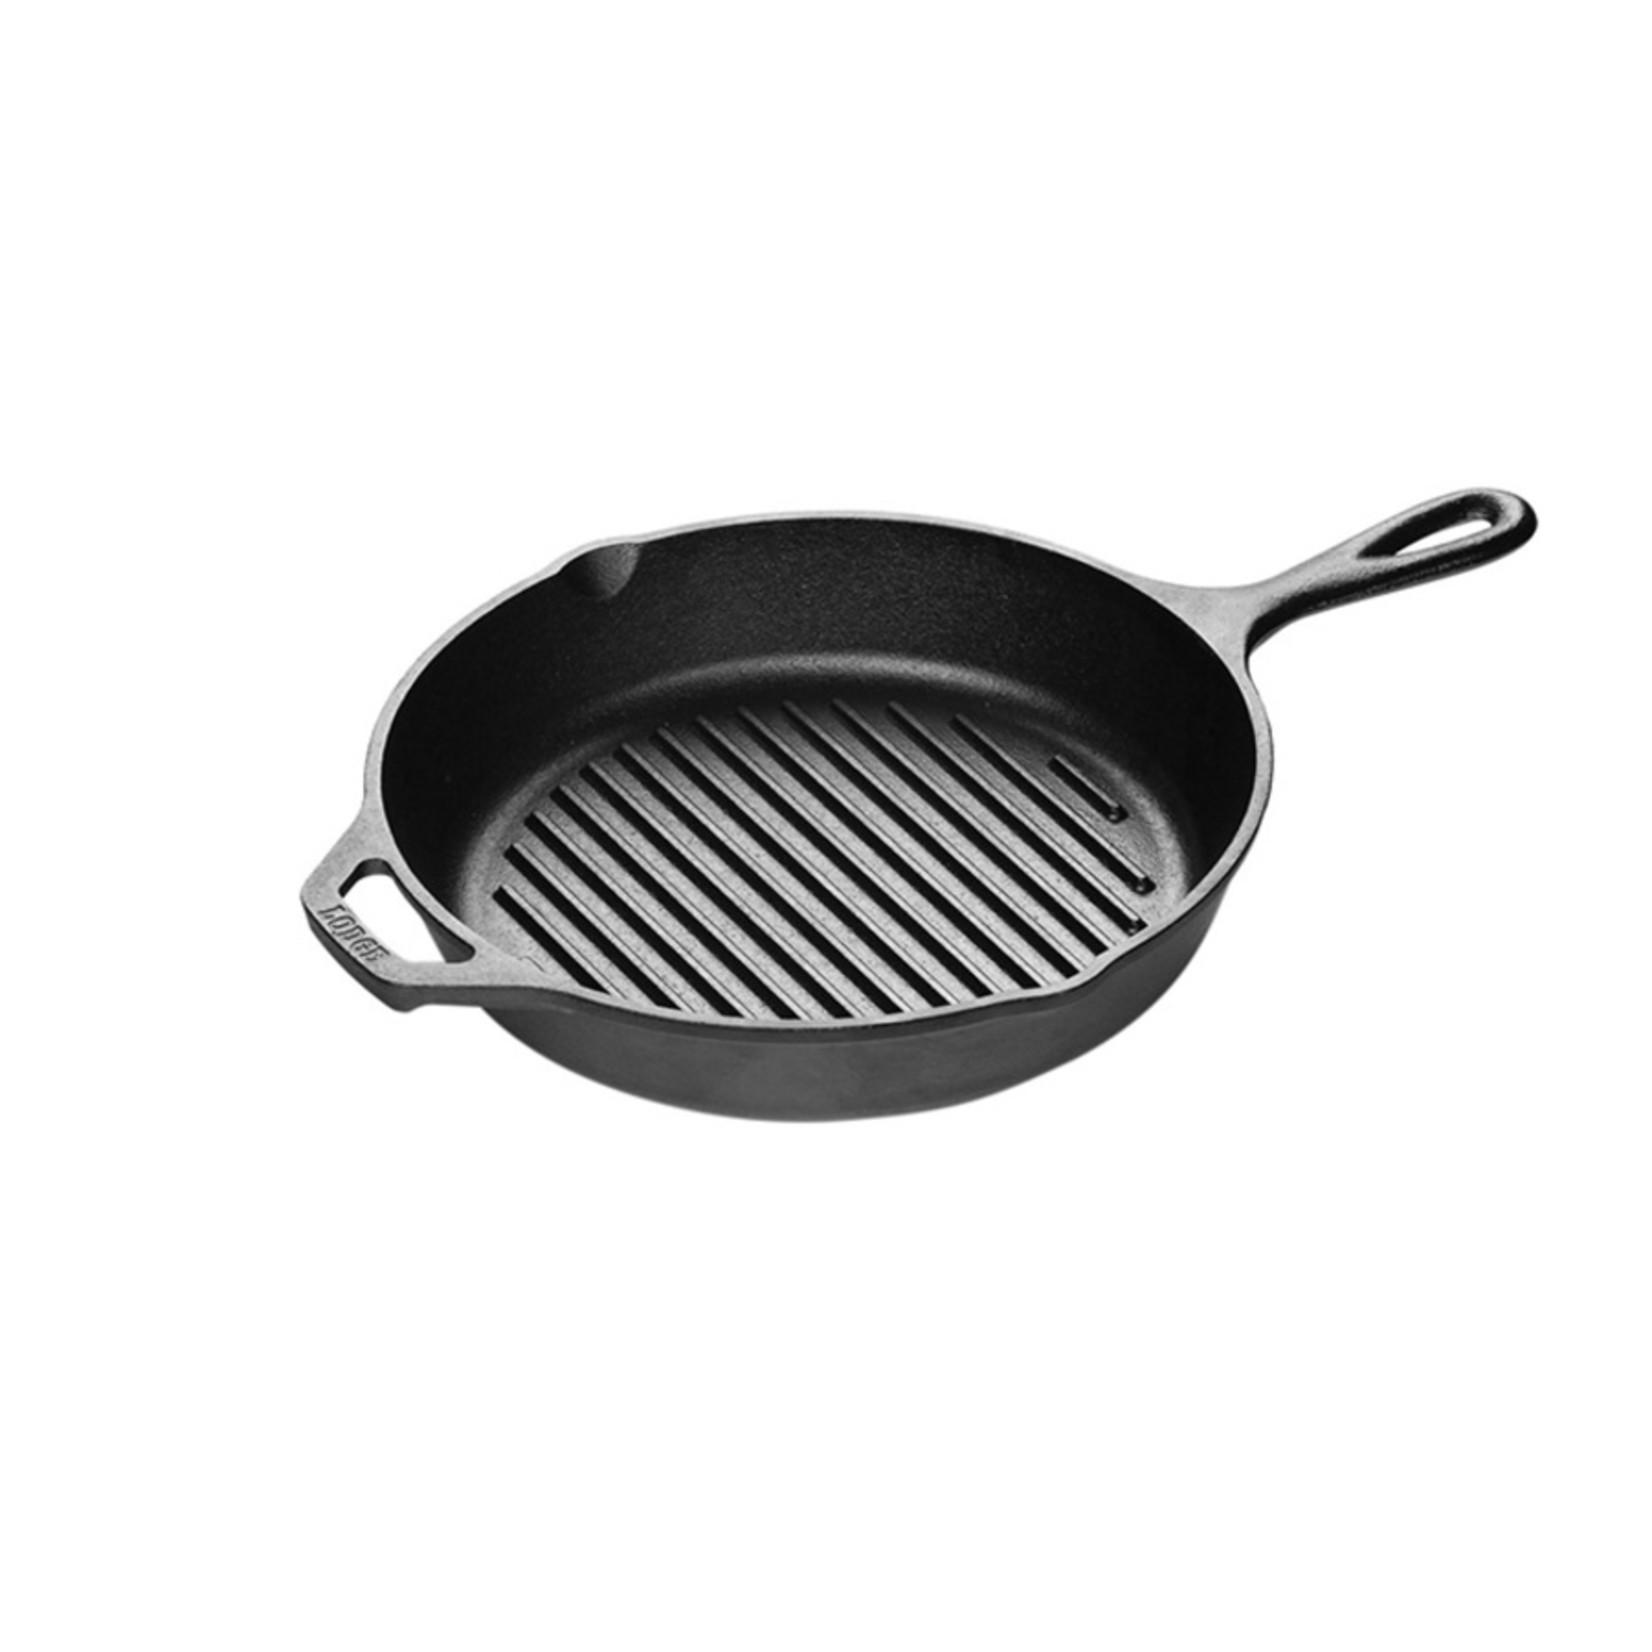 Lodge Blacklock Grill Pan 12 inch